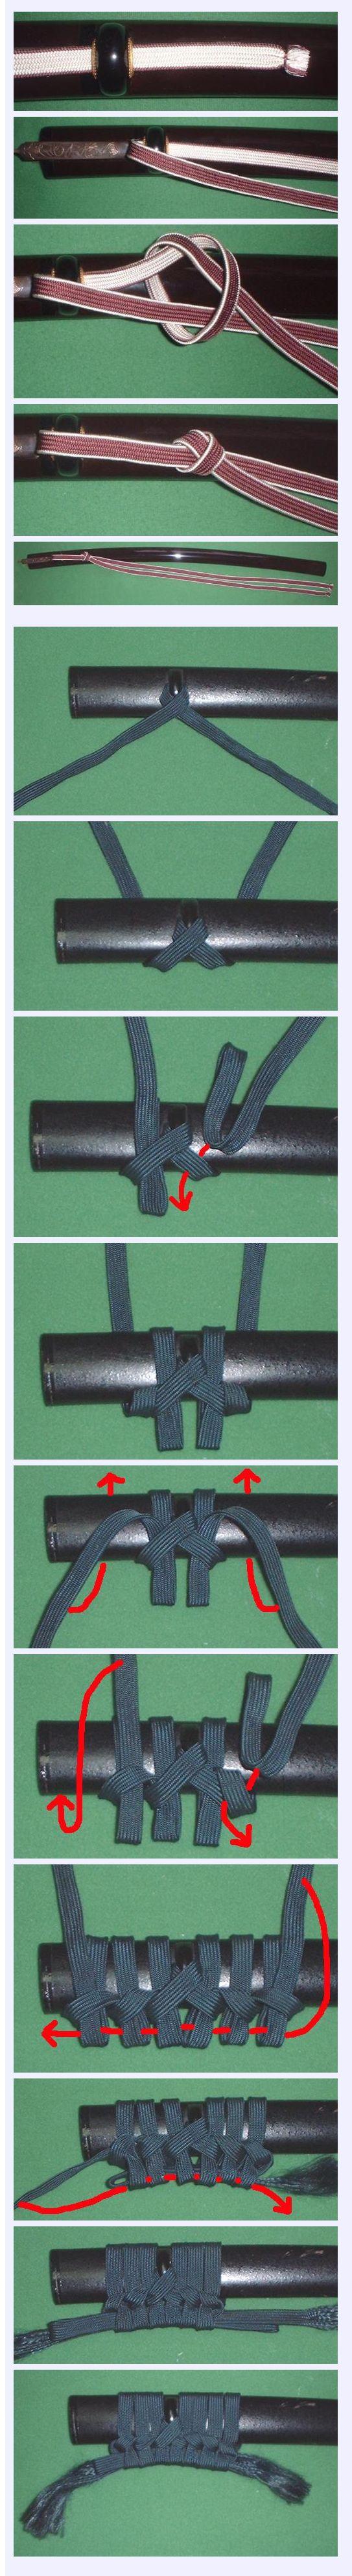 How to tie sageo on a saya